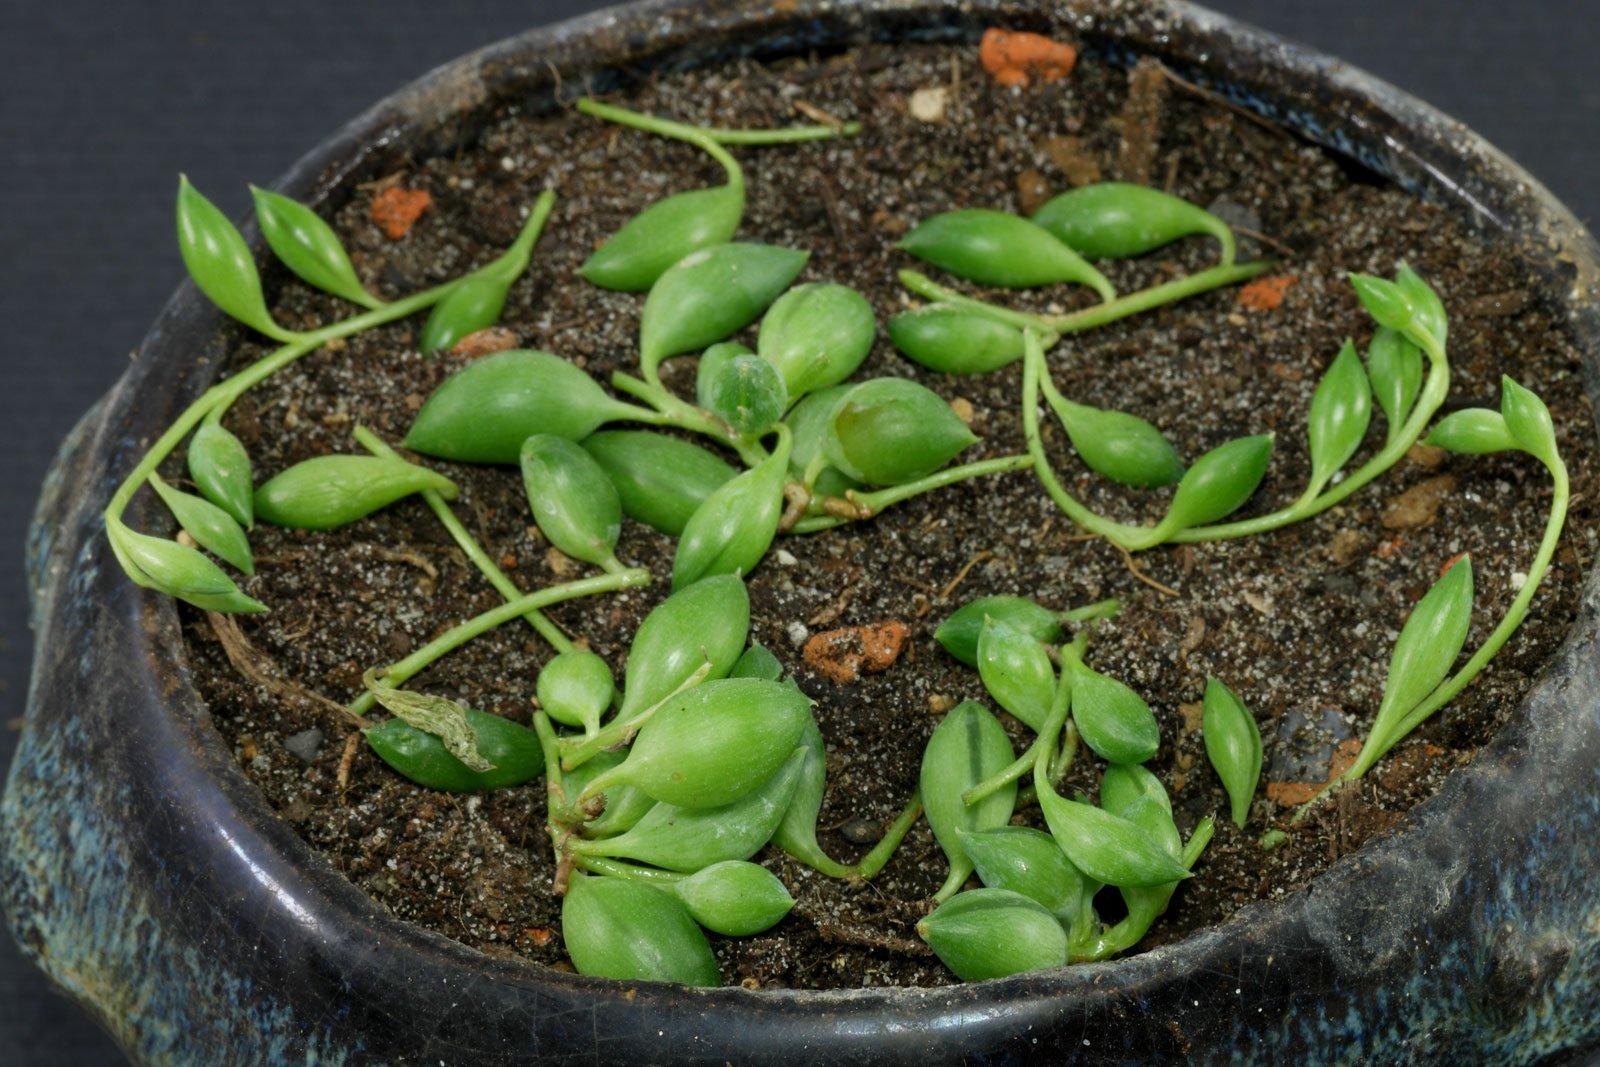 Erbsenpflanze Stecklinge